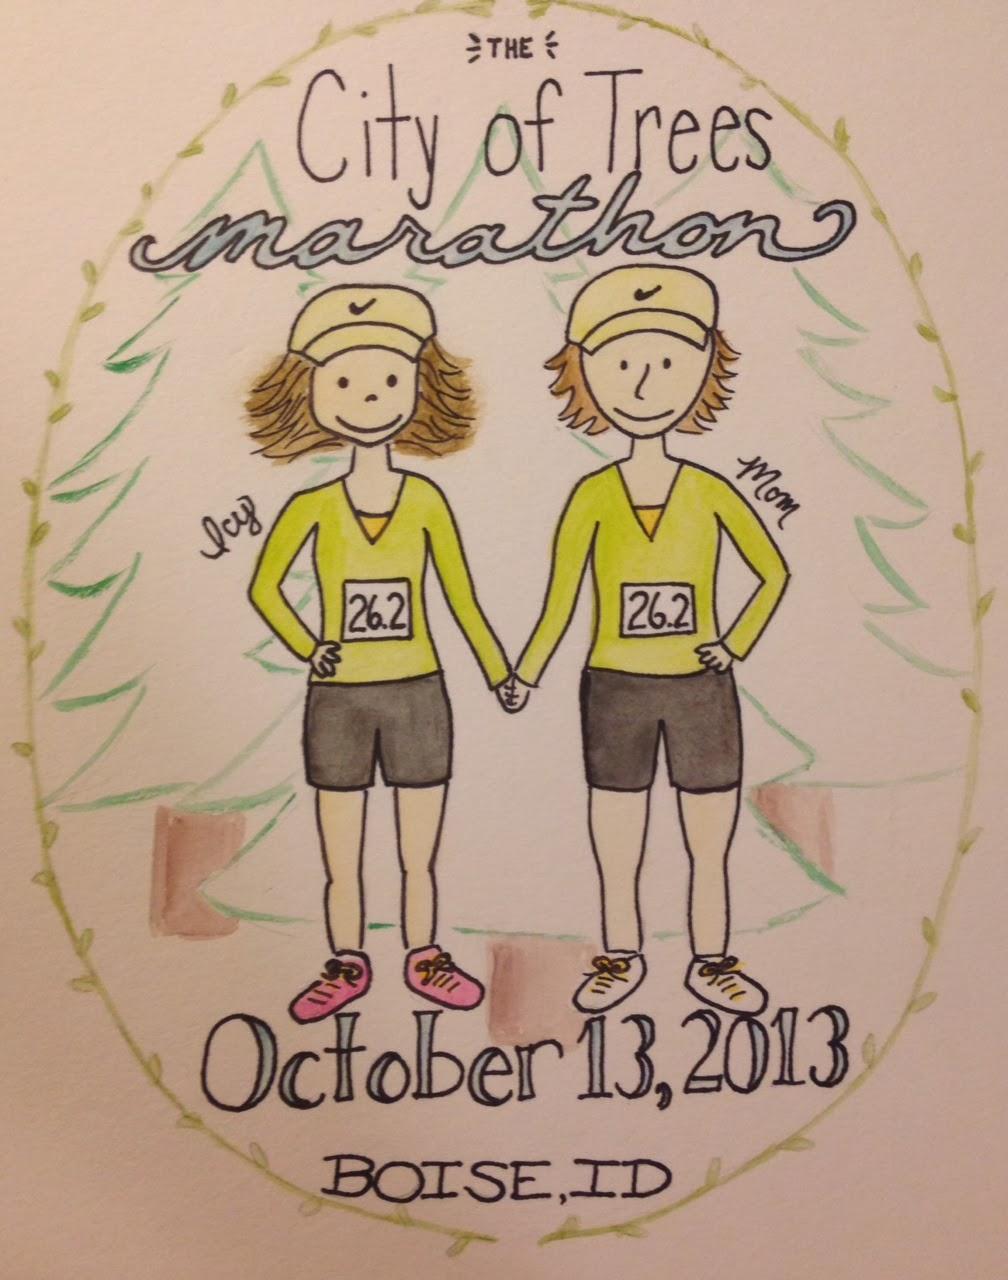 City of Trees Marathon Portrait